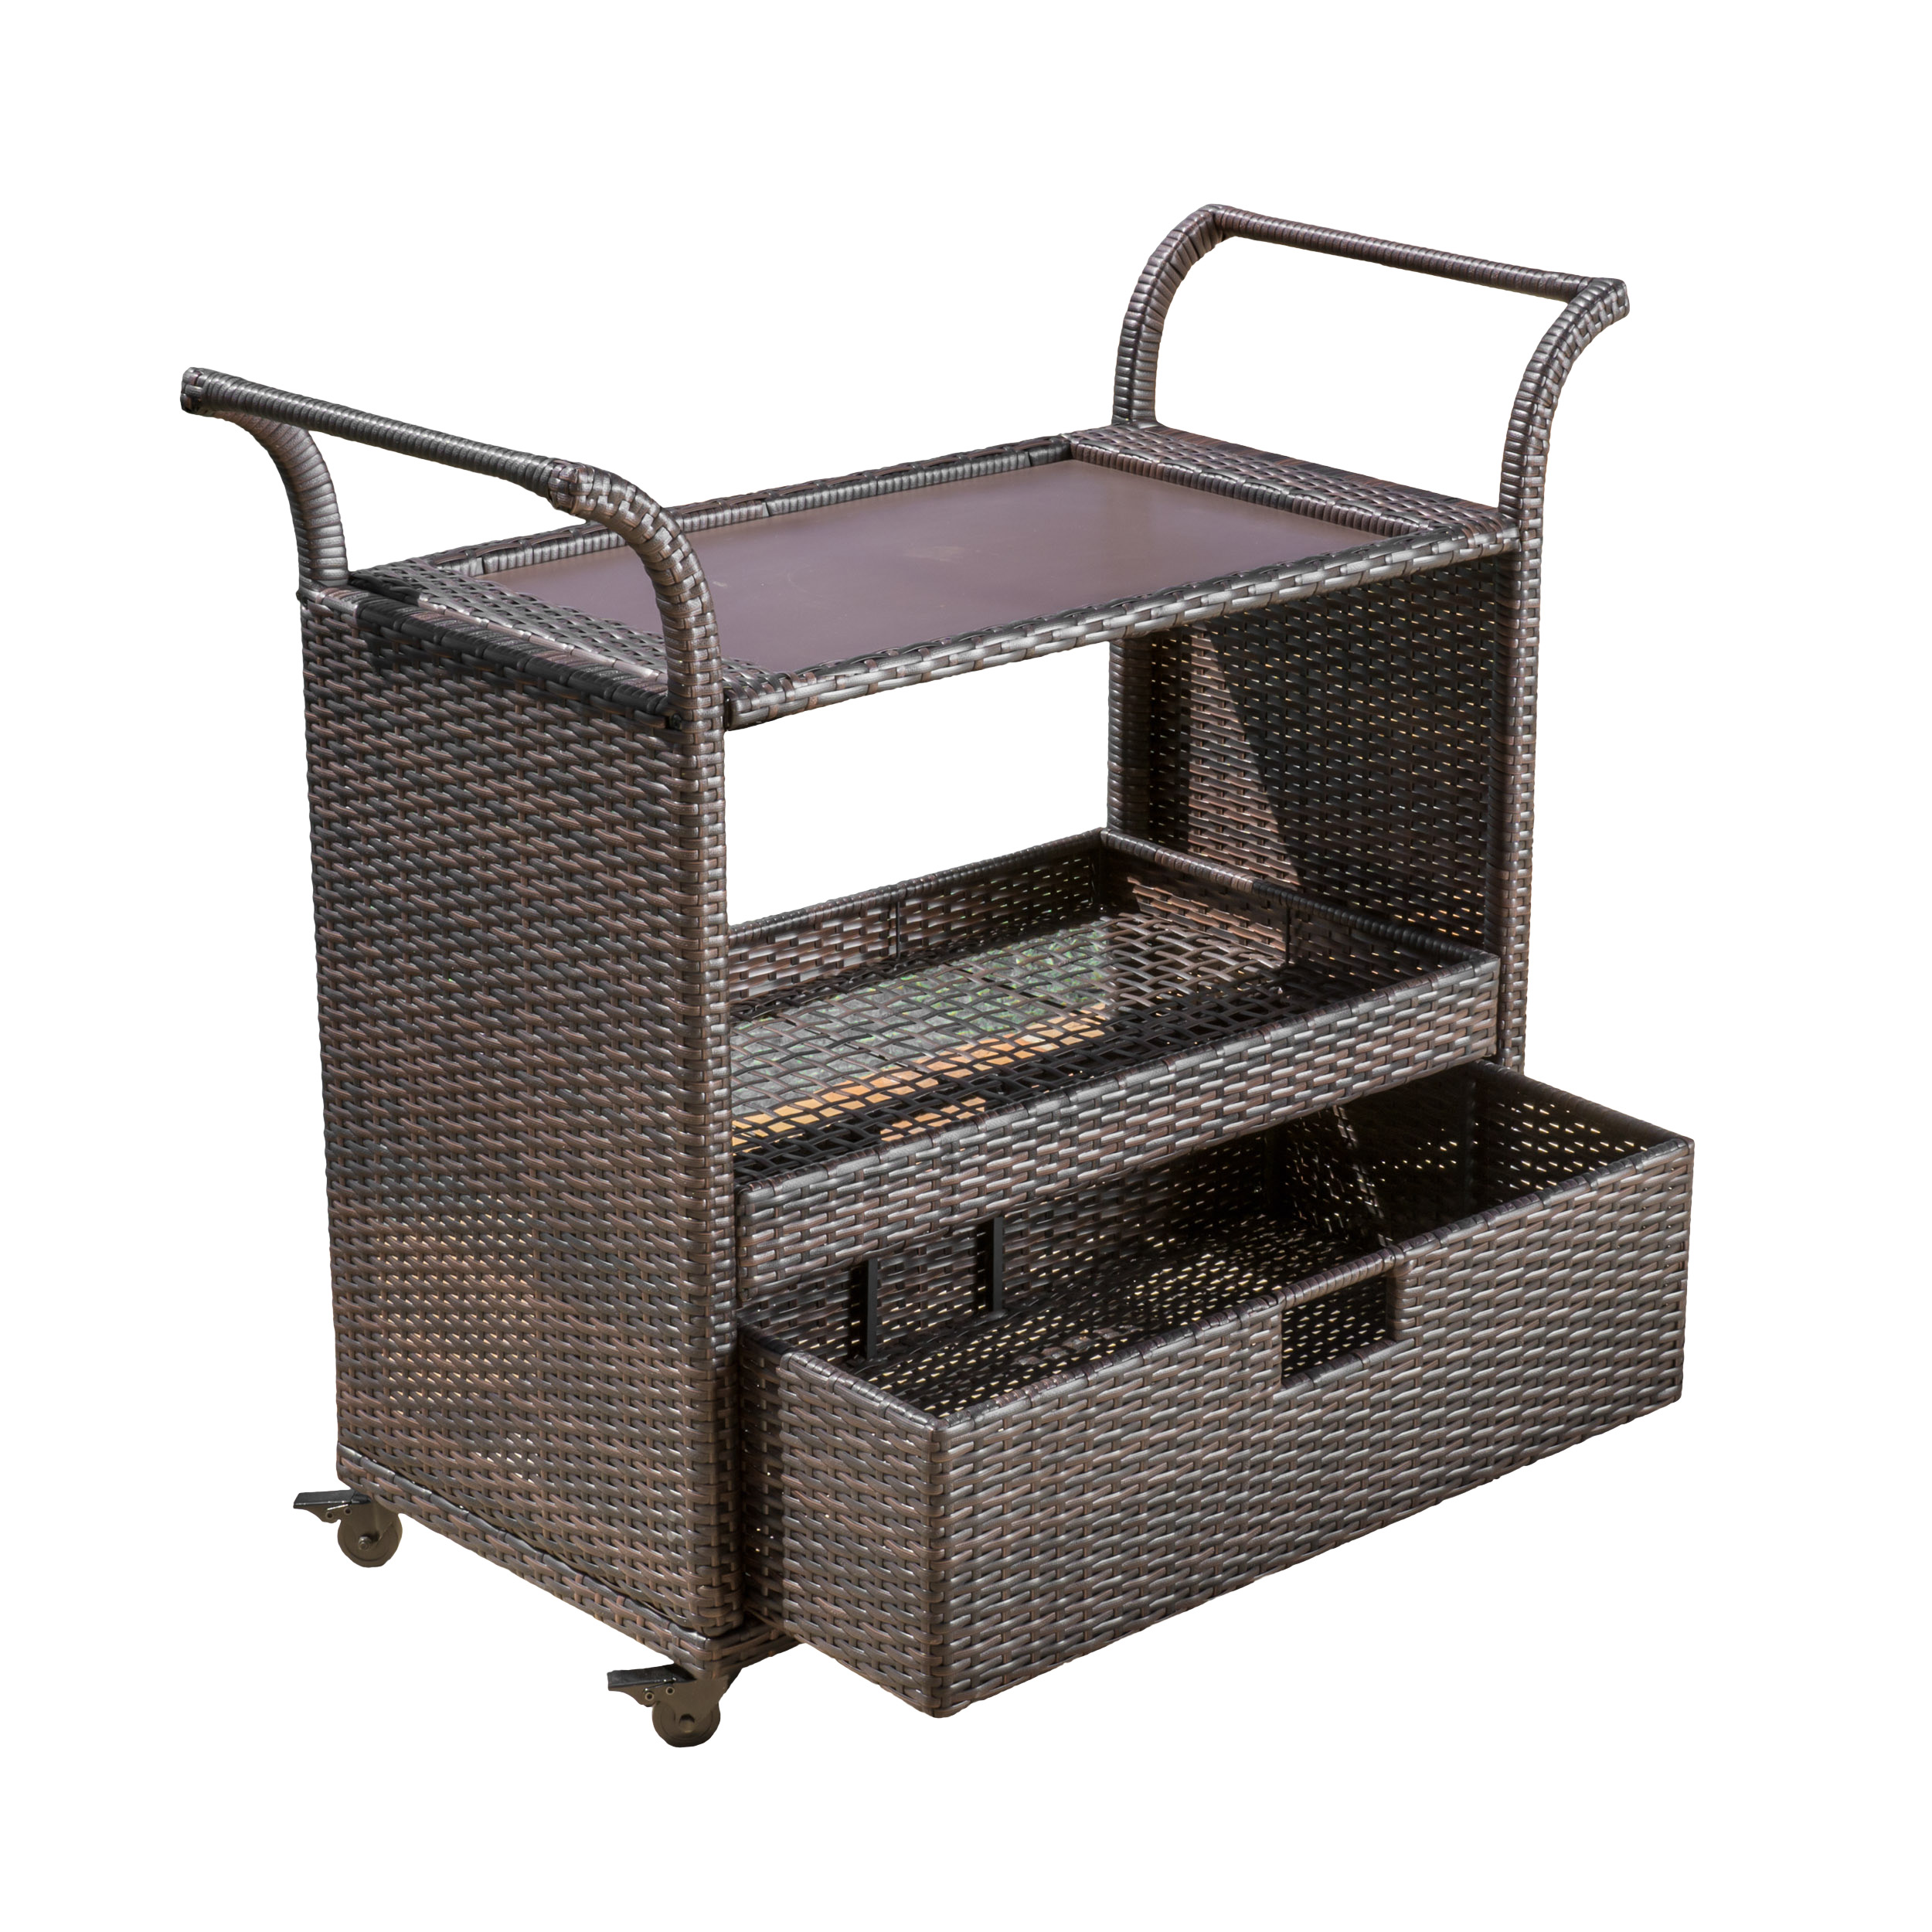 Orosei Multibrown Wicker Indoor Bar Cart with Casters